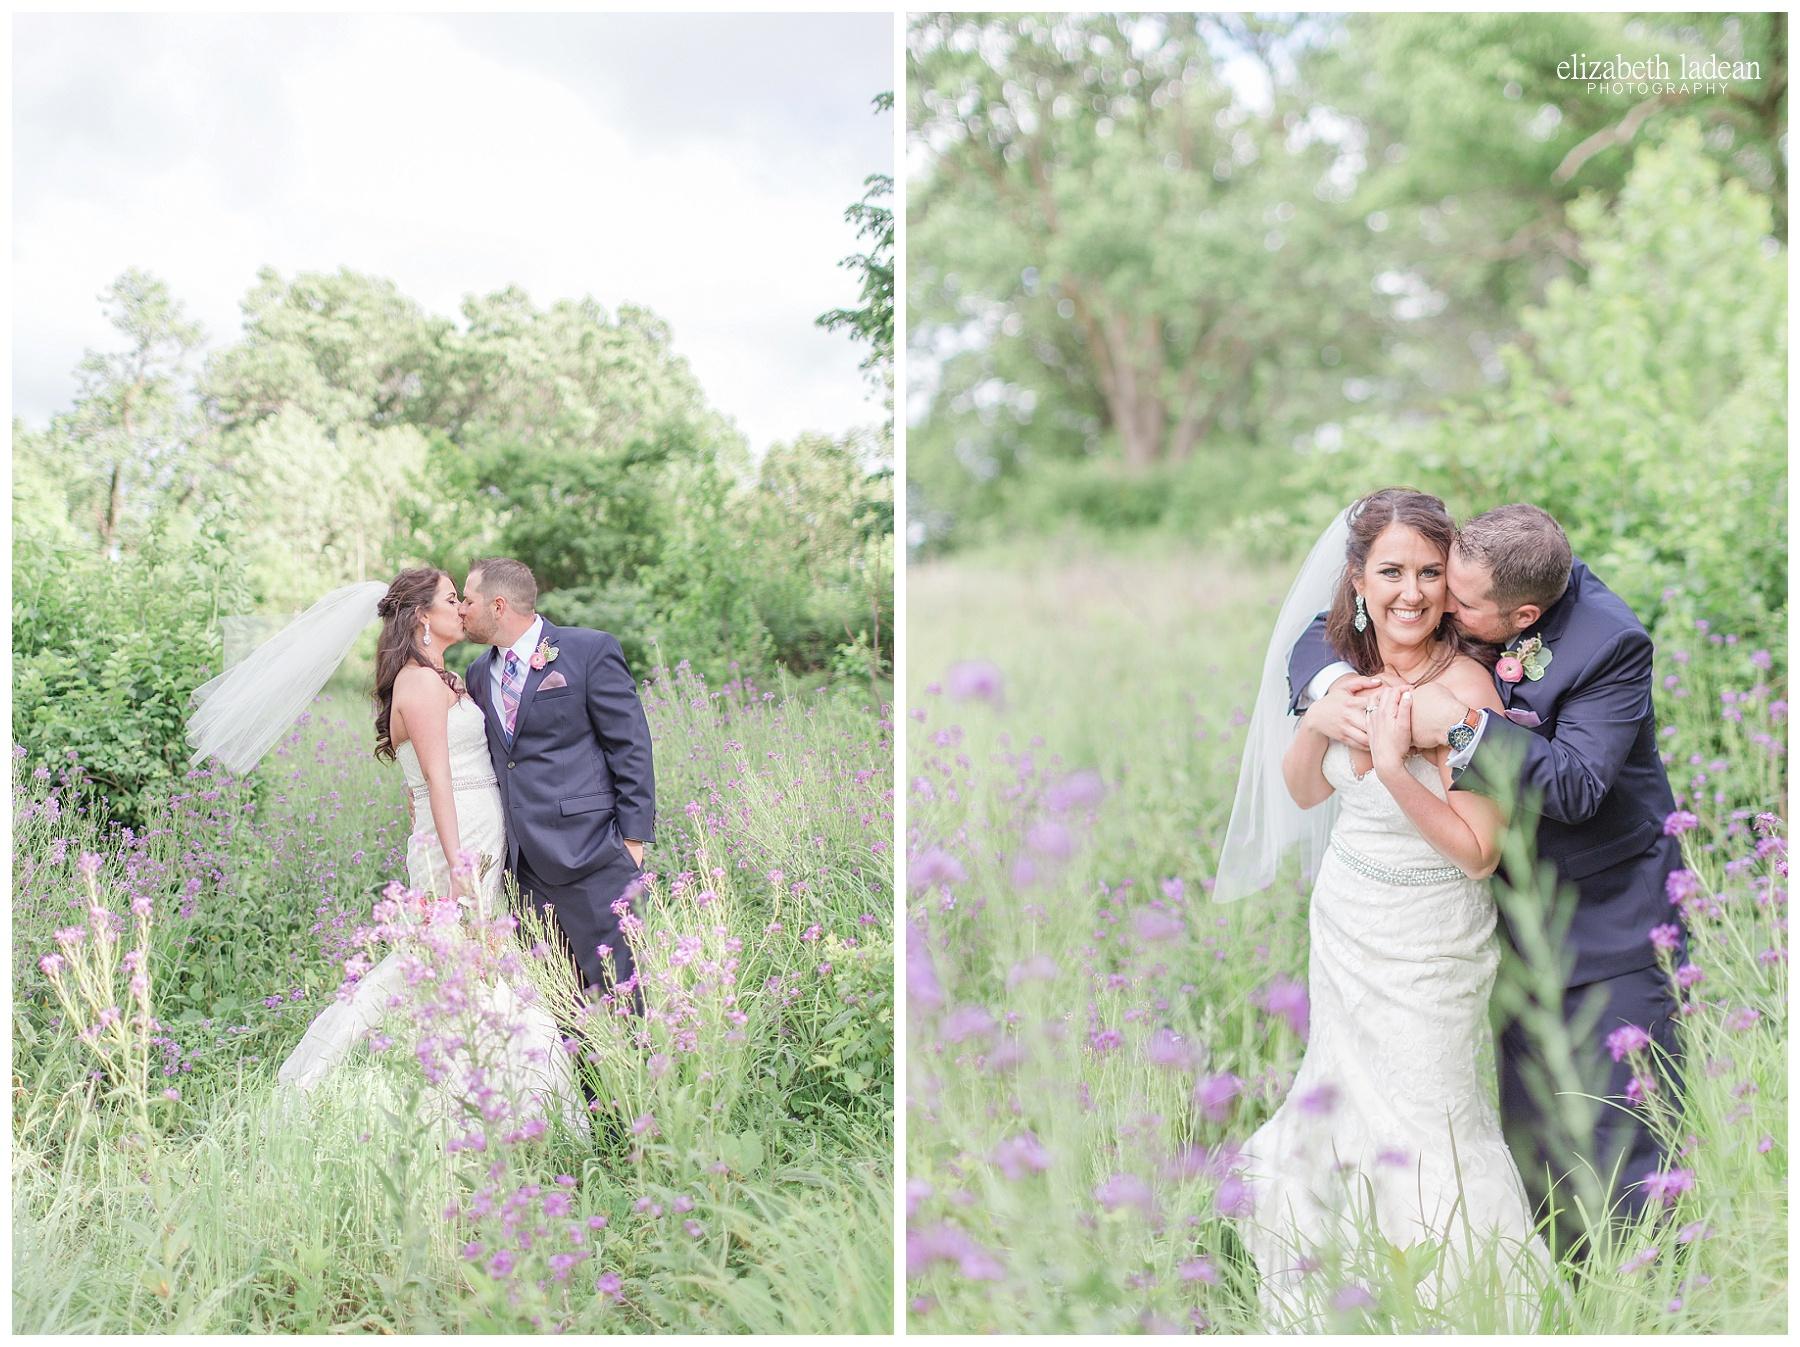 Hillcrest-Country-Club-Kansas-City-Wedding-Photography-E+J-0520-Elizabeth-Ladean-Photography-photo_0848.jpg